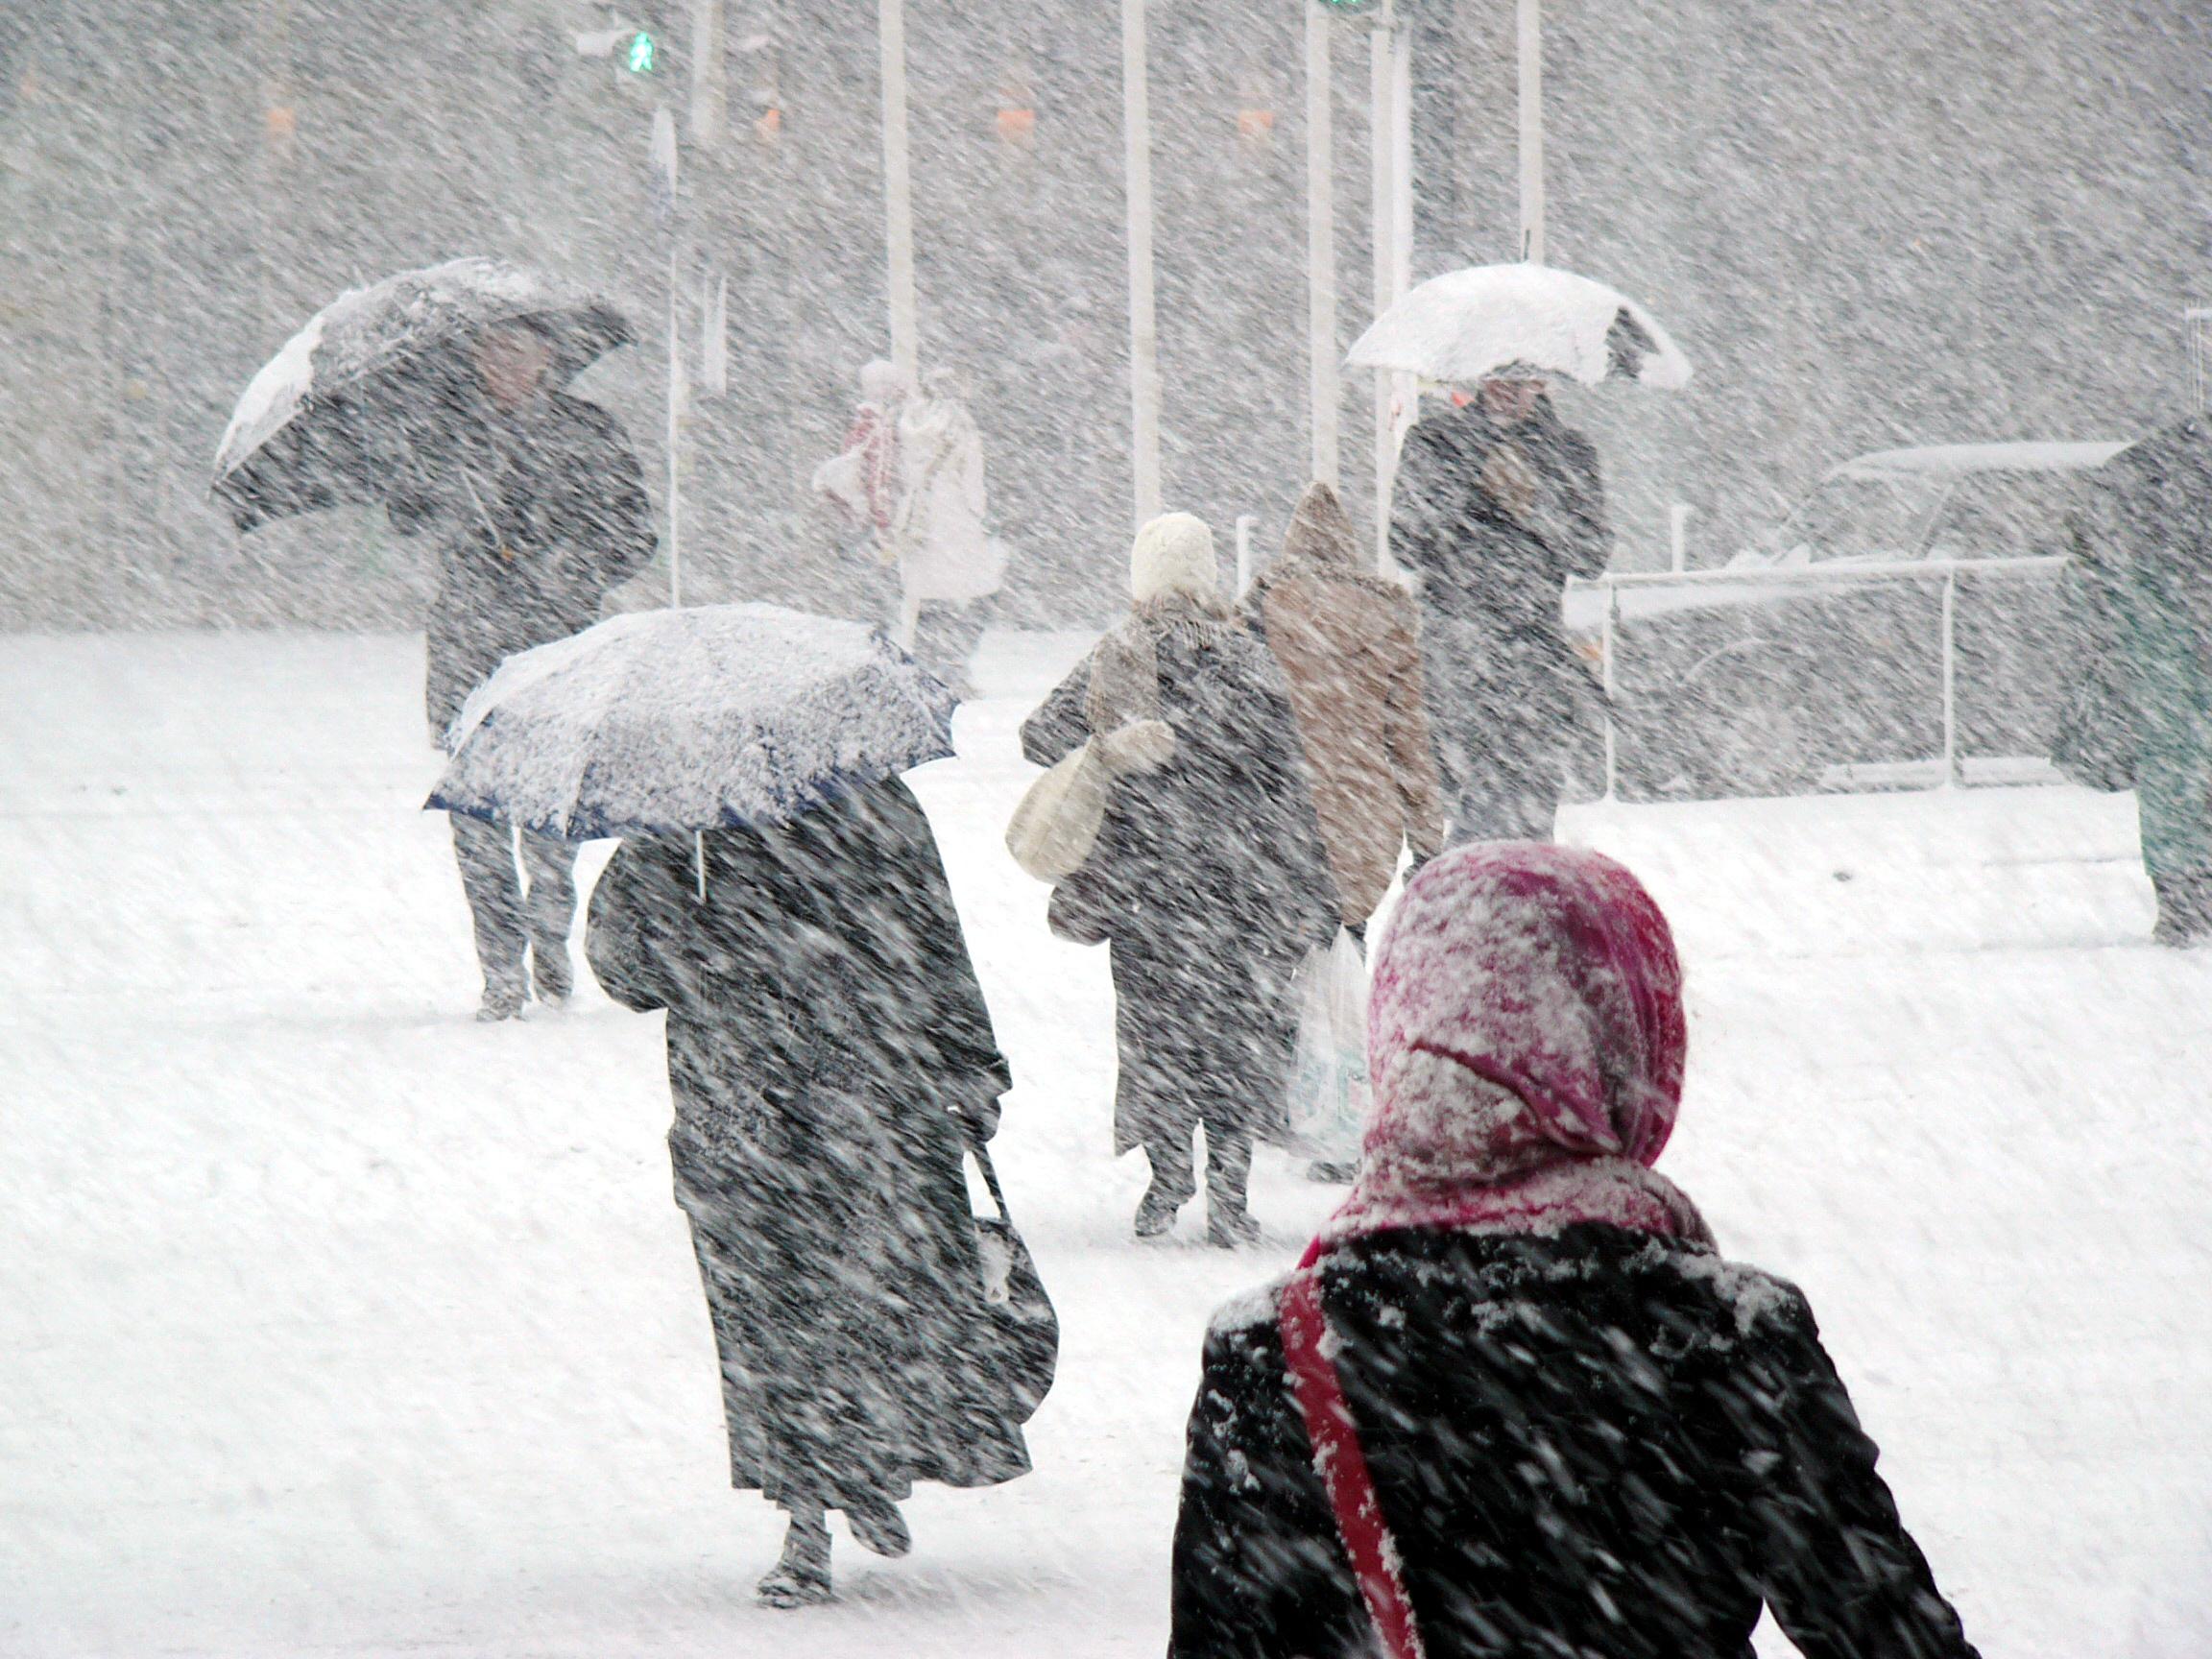 People walking in a snowstorm